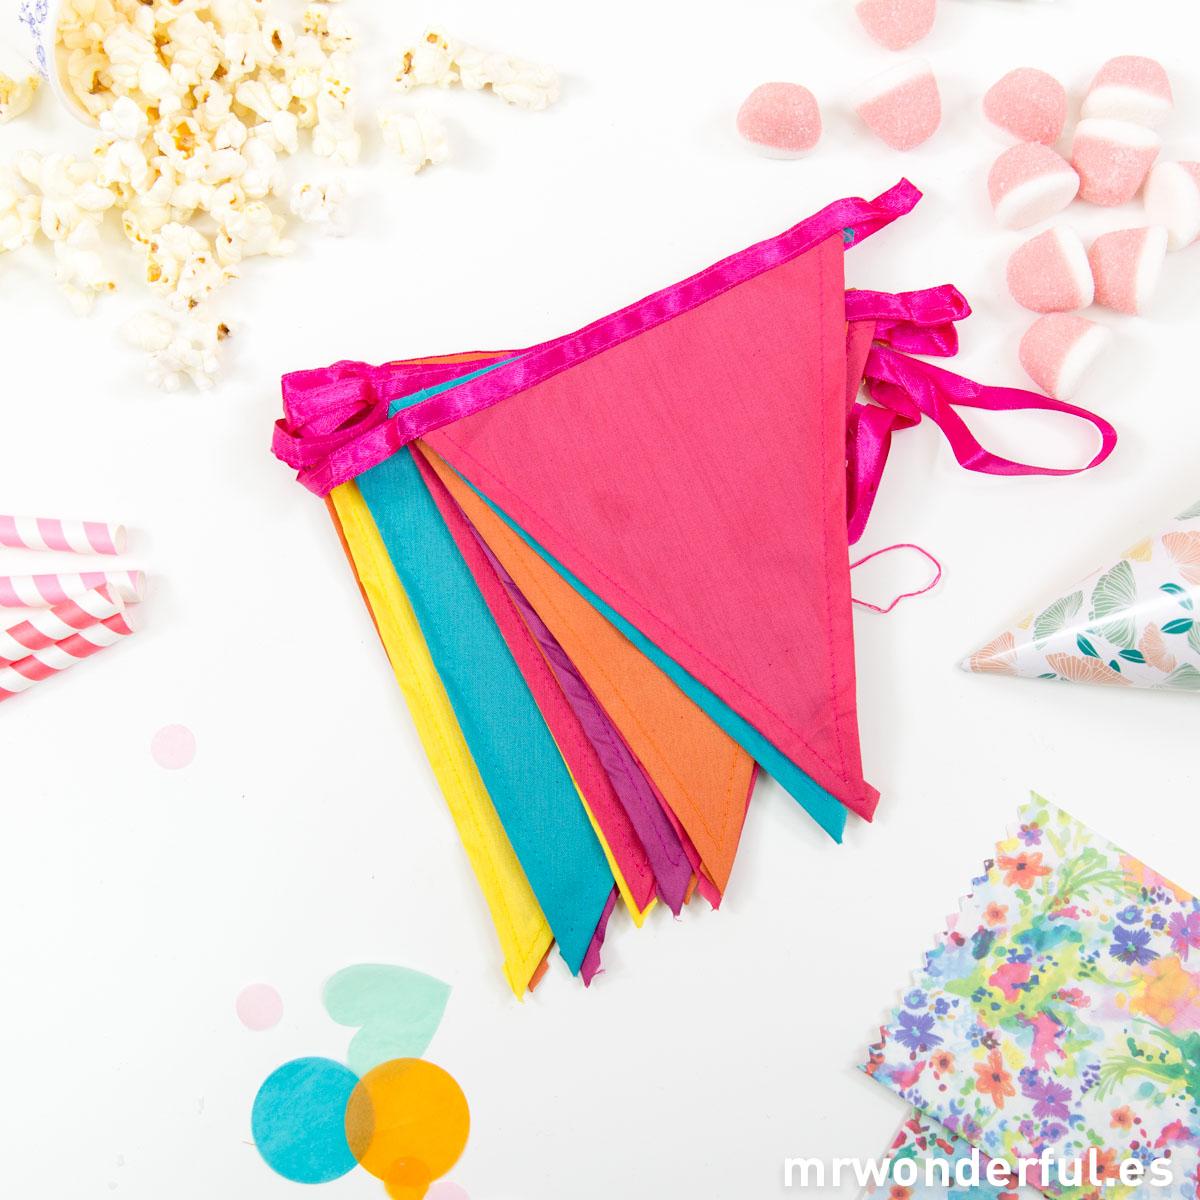 mrwonderful_DD-FABBUFI_guirnalda-banderines-colores-1